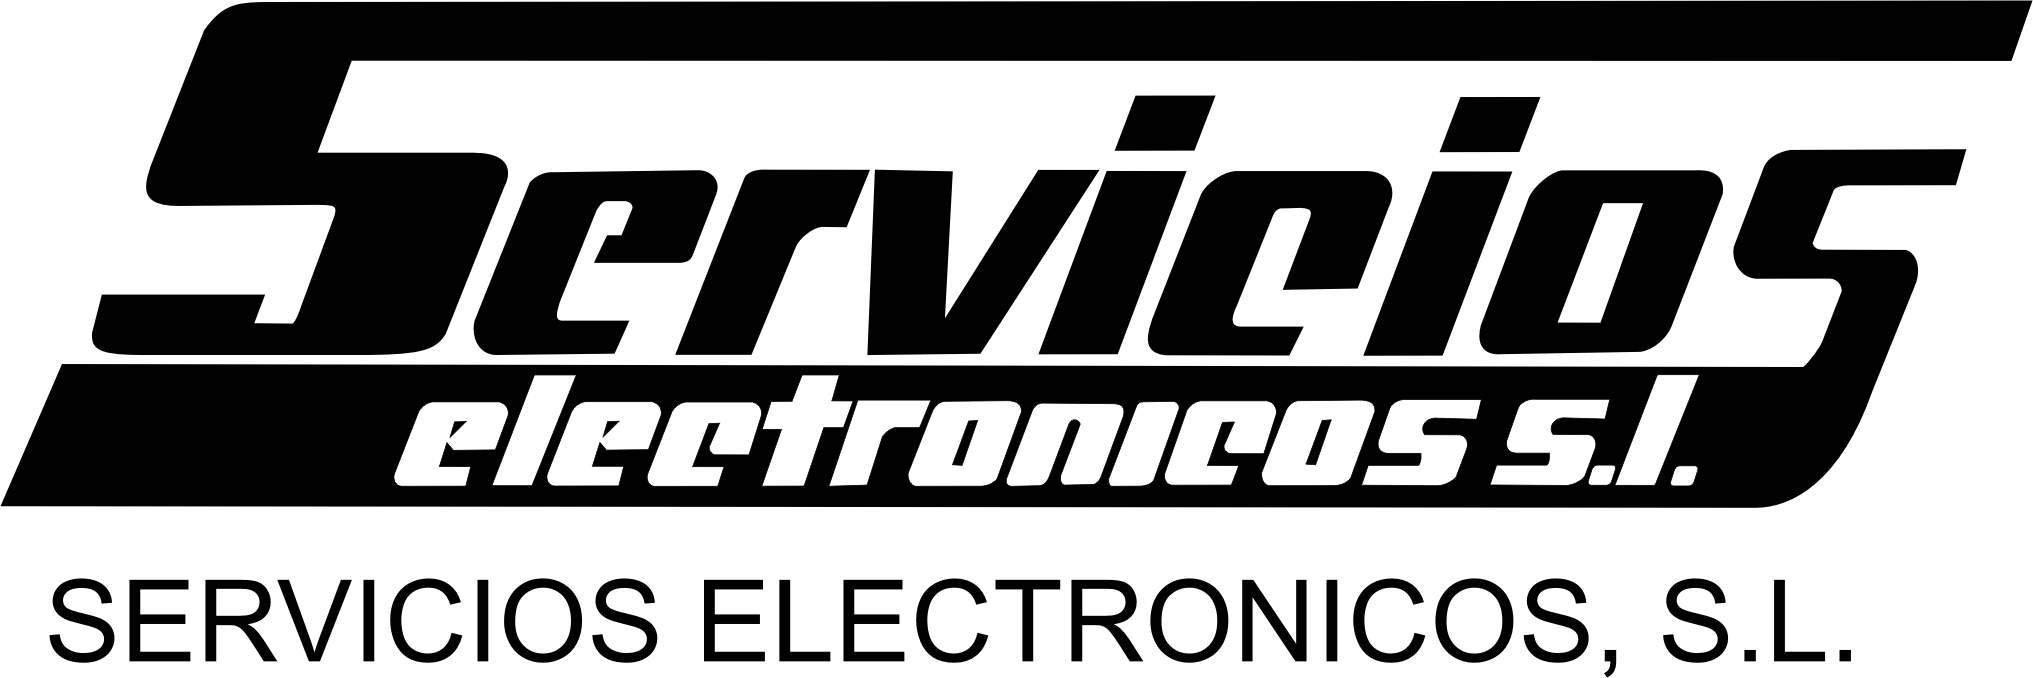 SERVICIOS ELECTRONICOS S.L